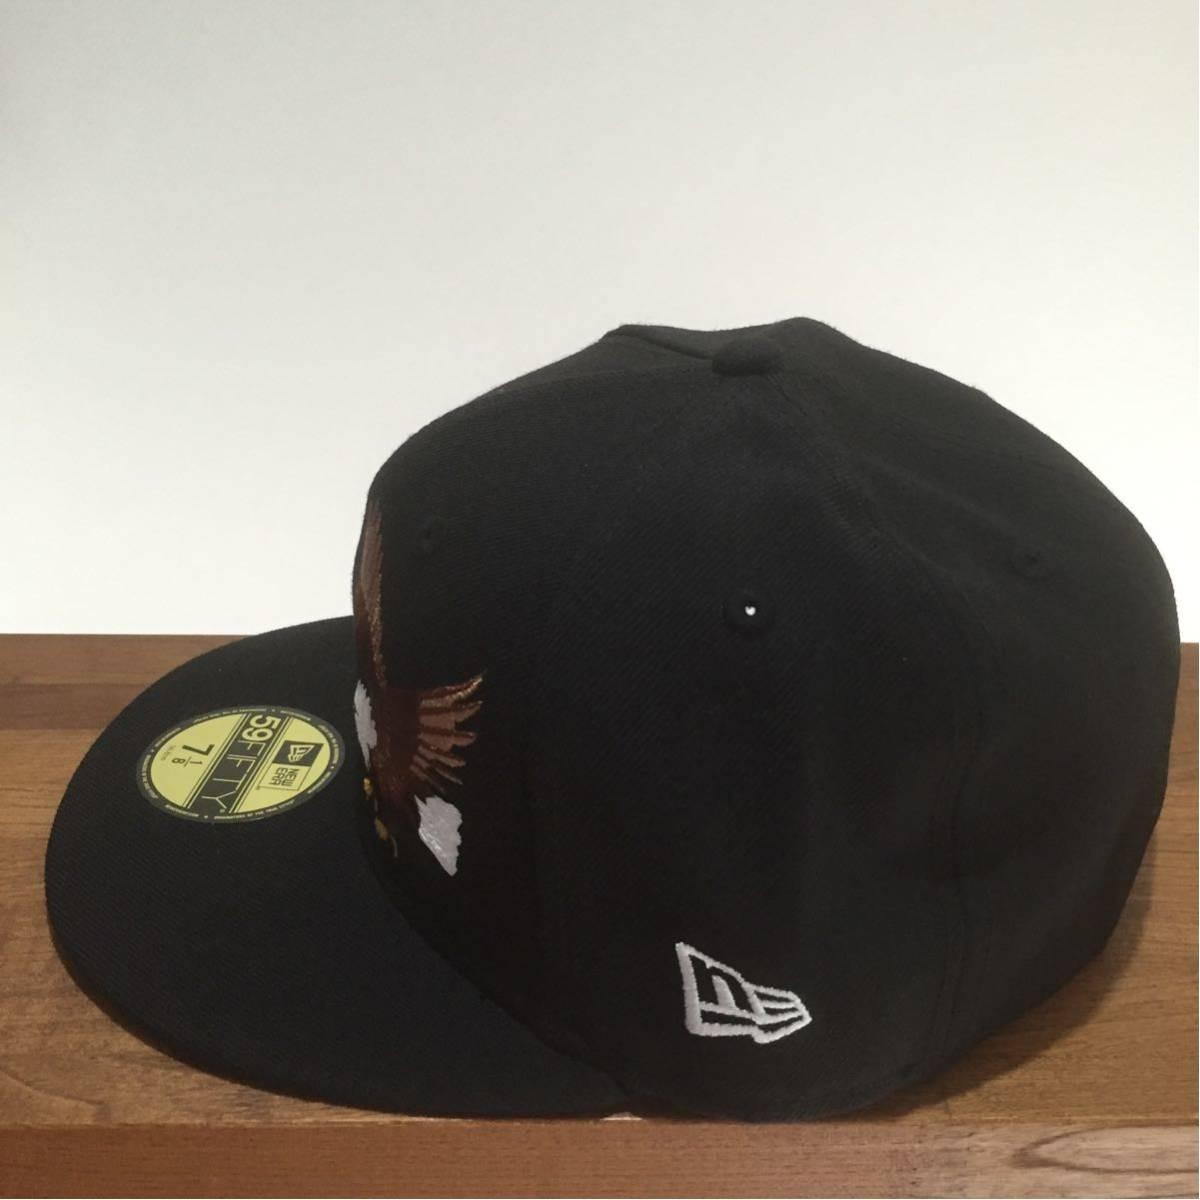 NEW ERA ニューエラ 59FIFTY スカジャンカスタム イーグル 鷲 刺繍 キャップ 帽子 野球帽 7 1/8 56.8cm 新品未使用 正規品 希少 限定 レア_画像3